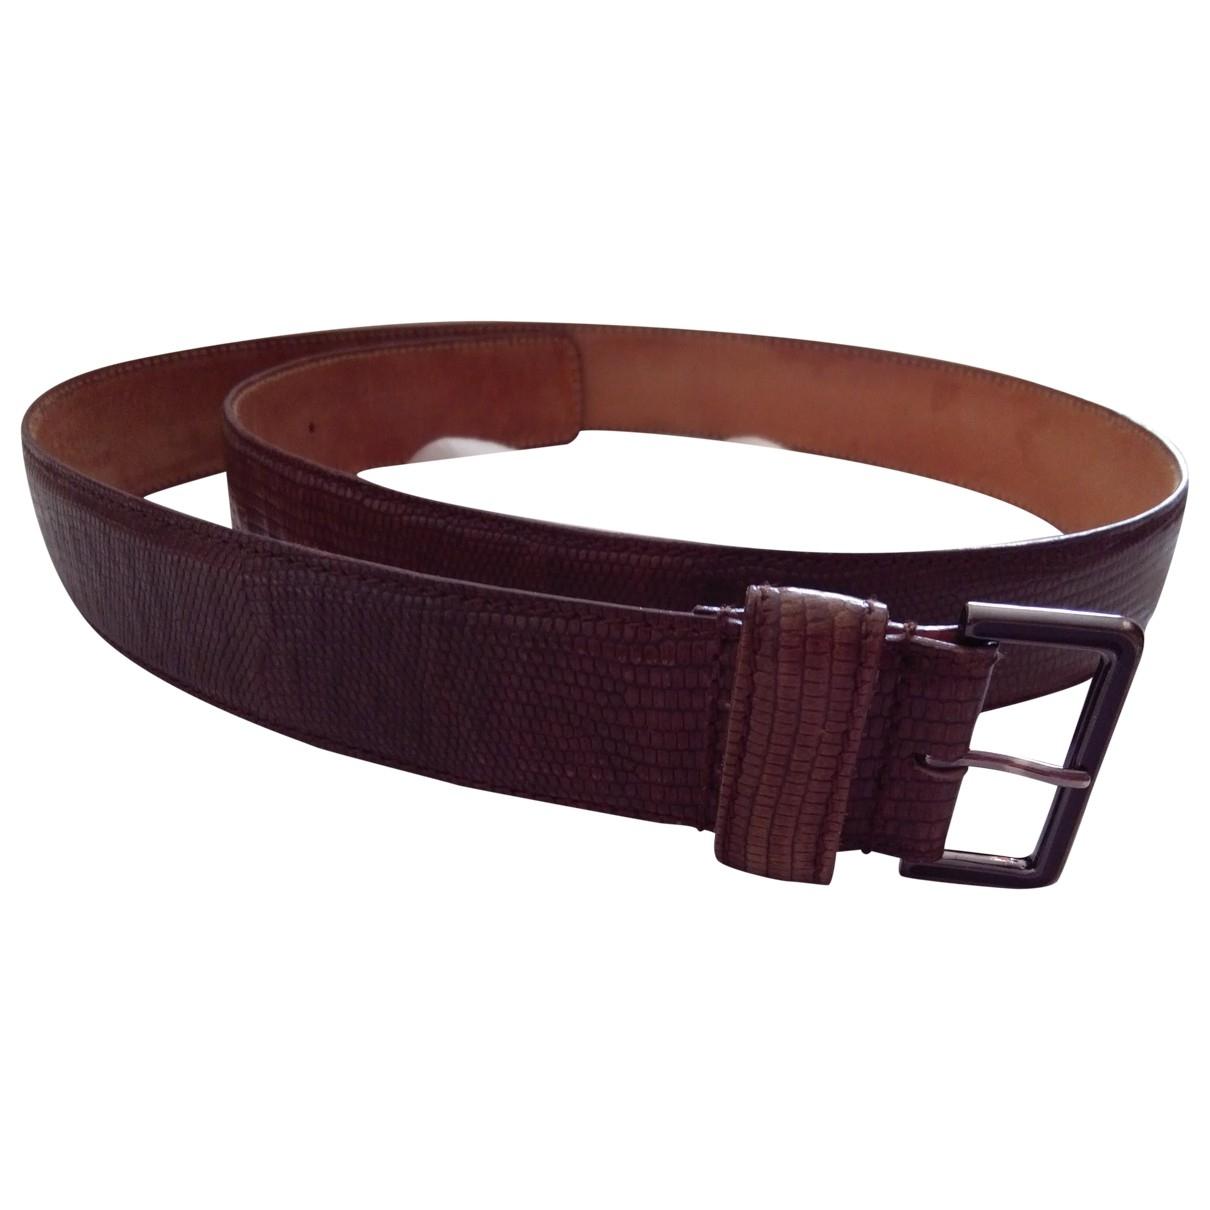 Furla \N Camel Leather belt for Women S International